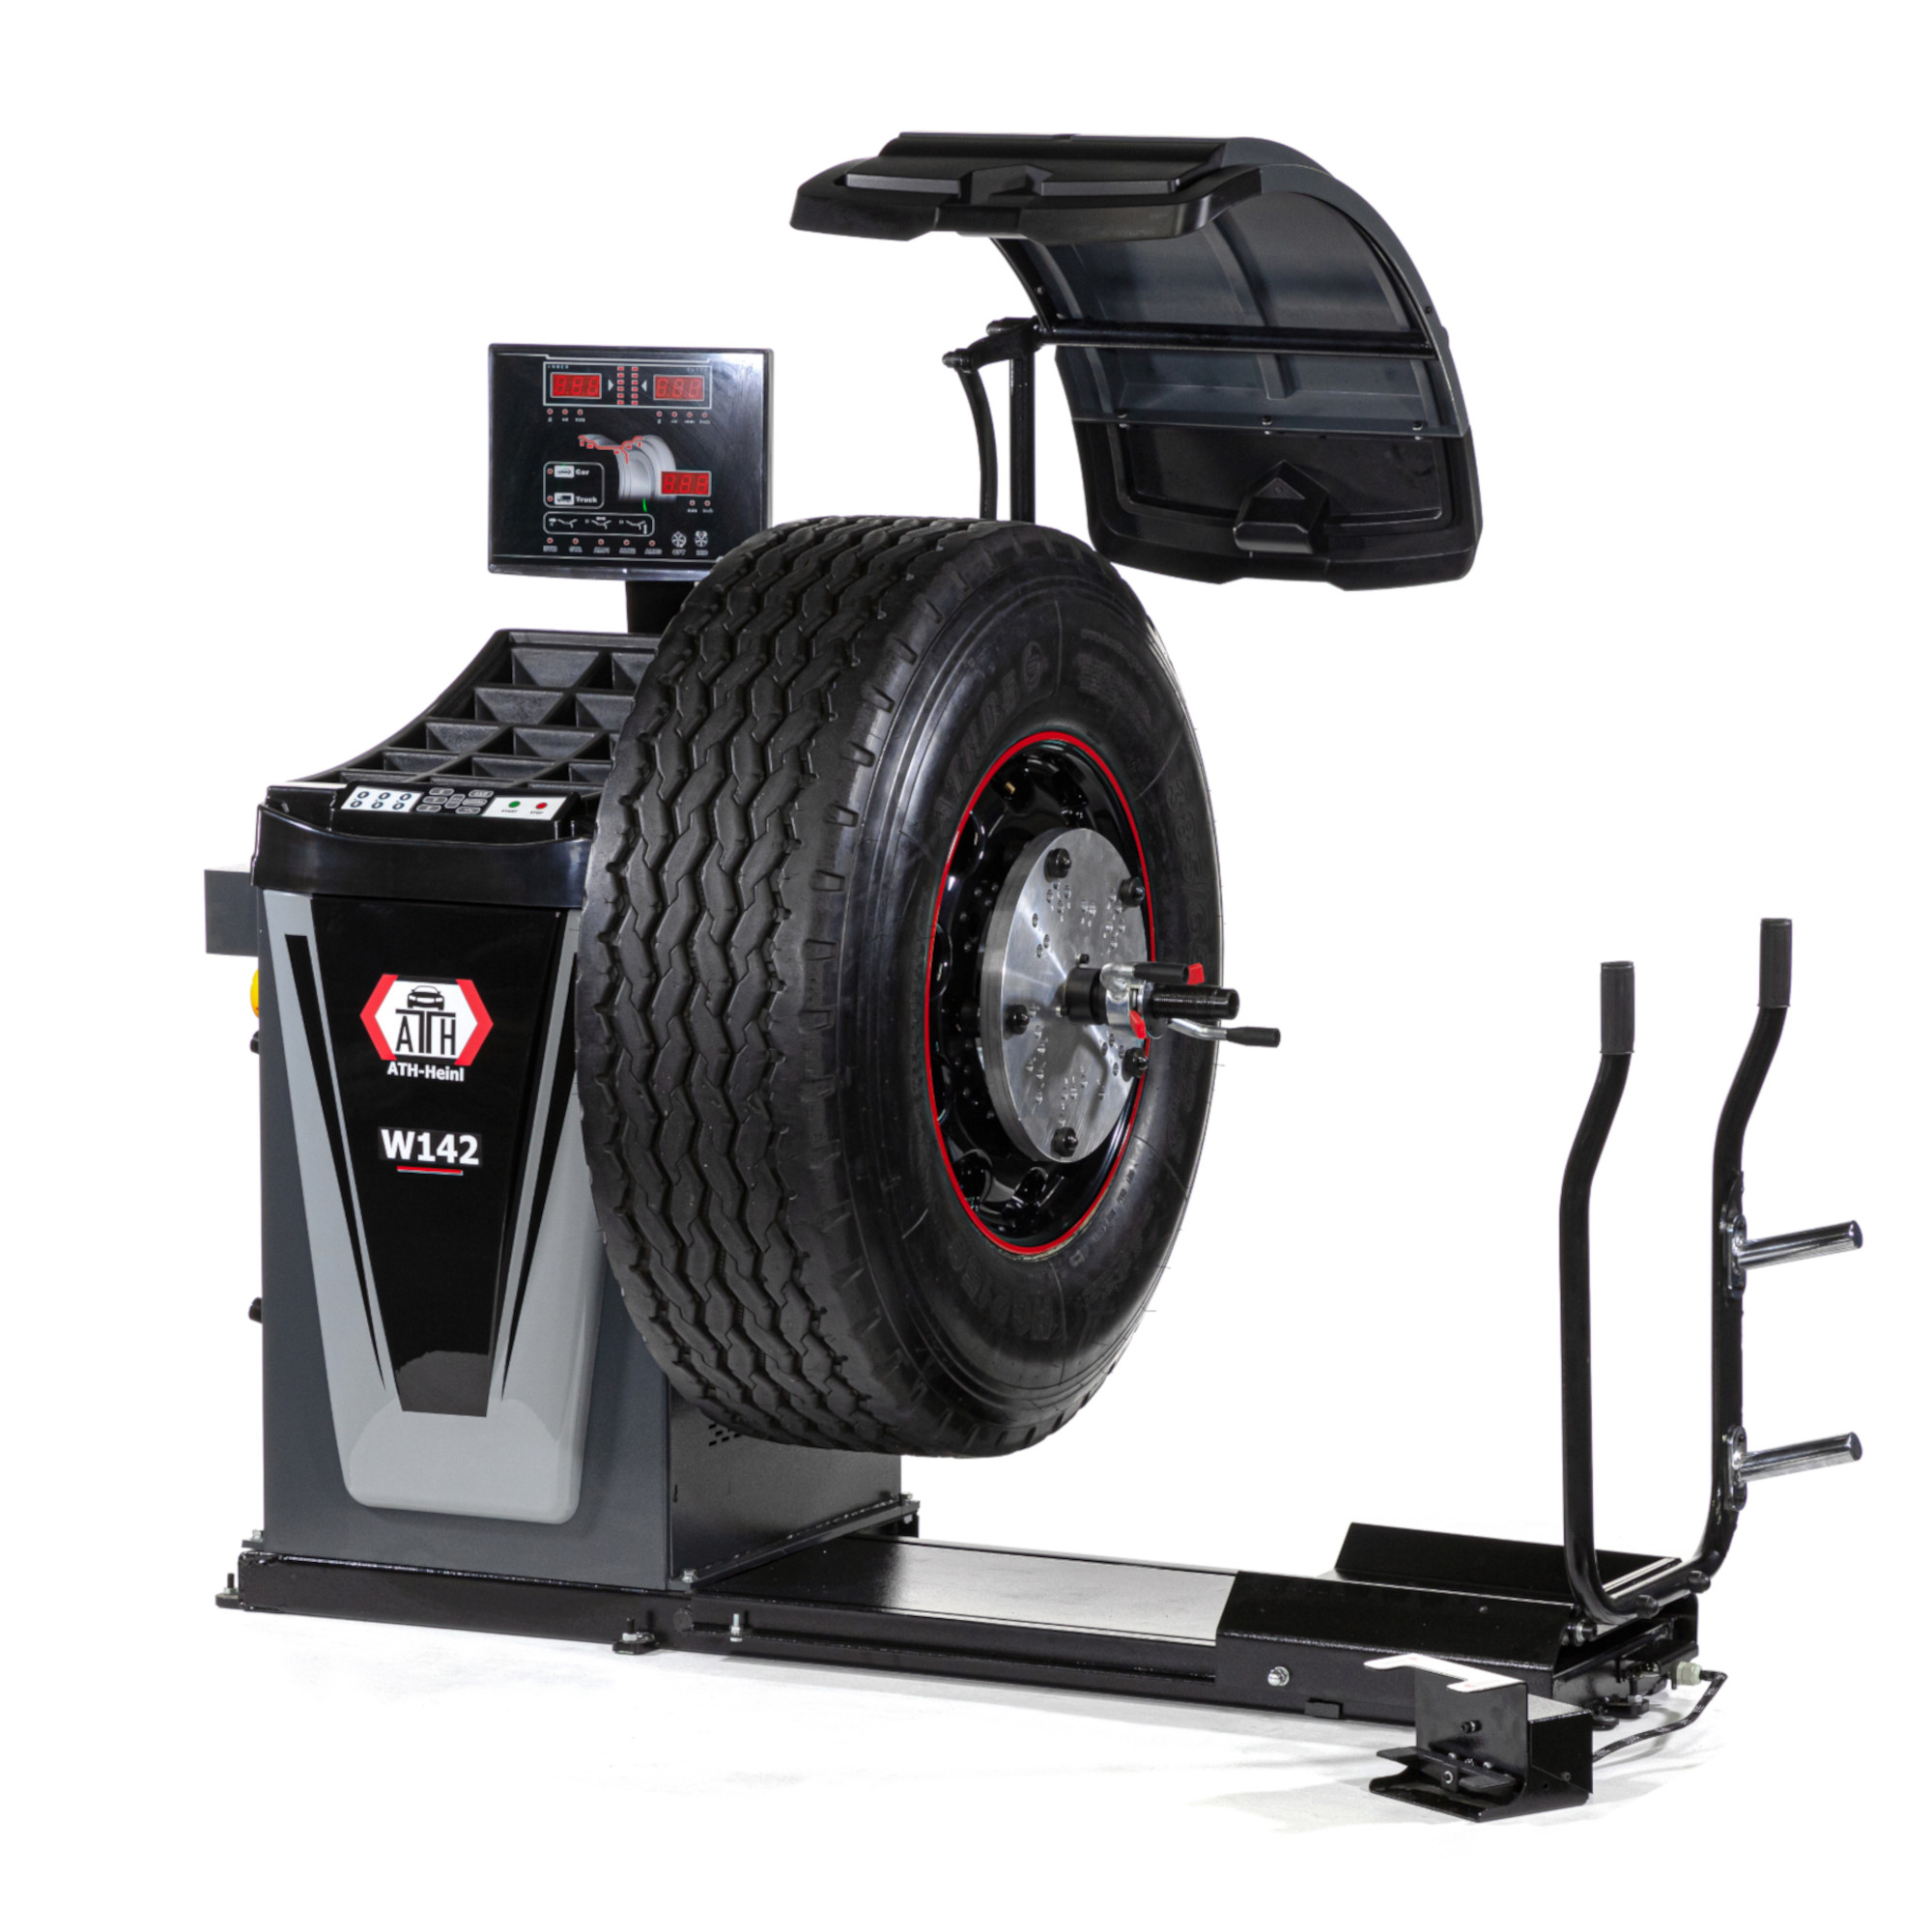 LKW-Reifenauswuchtmaschinen